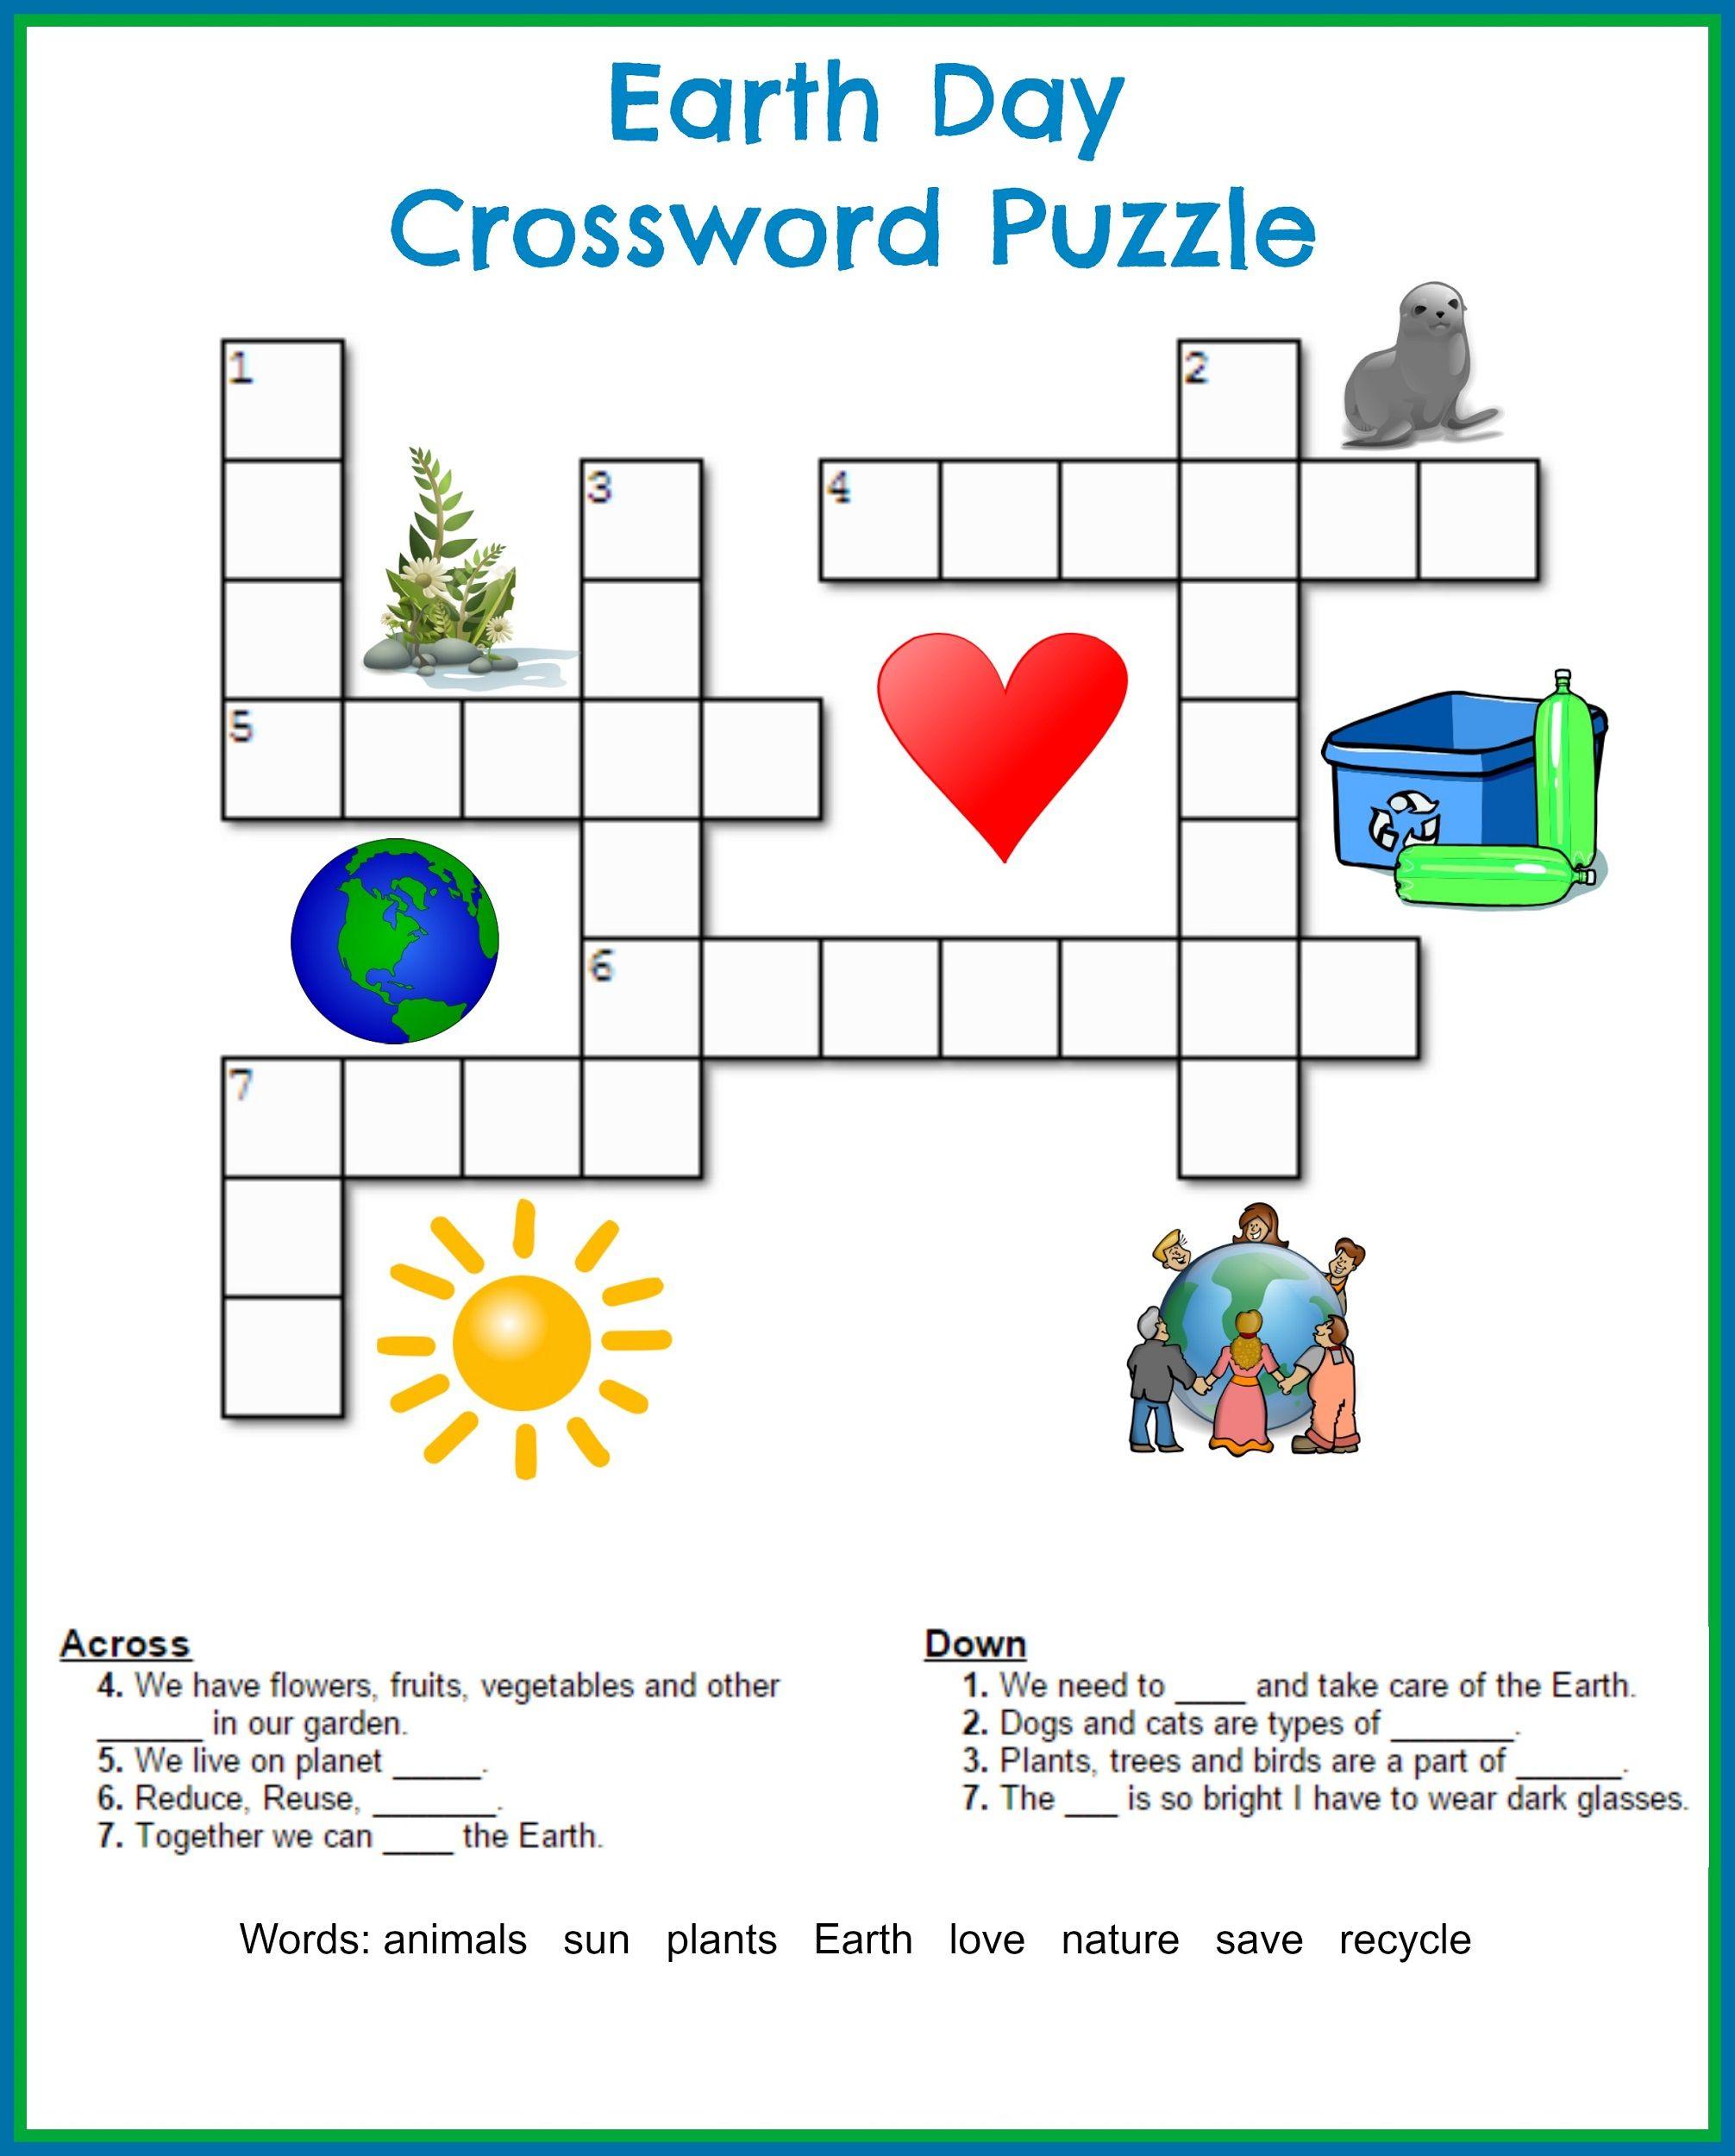 Printable Crossword Puzzles Kids   Crossword Puzzles On Earth - Printable Puzzles For Kids